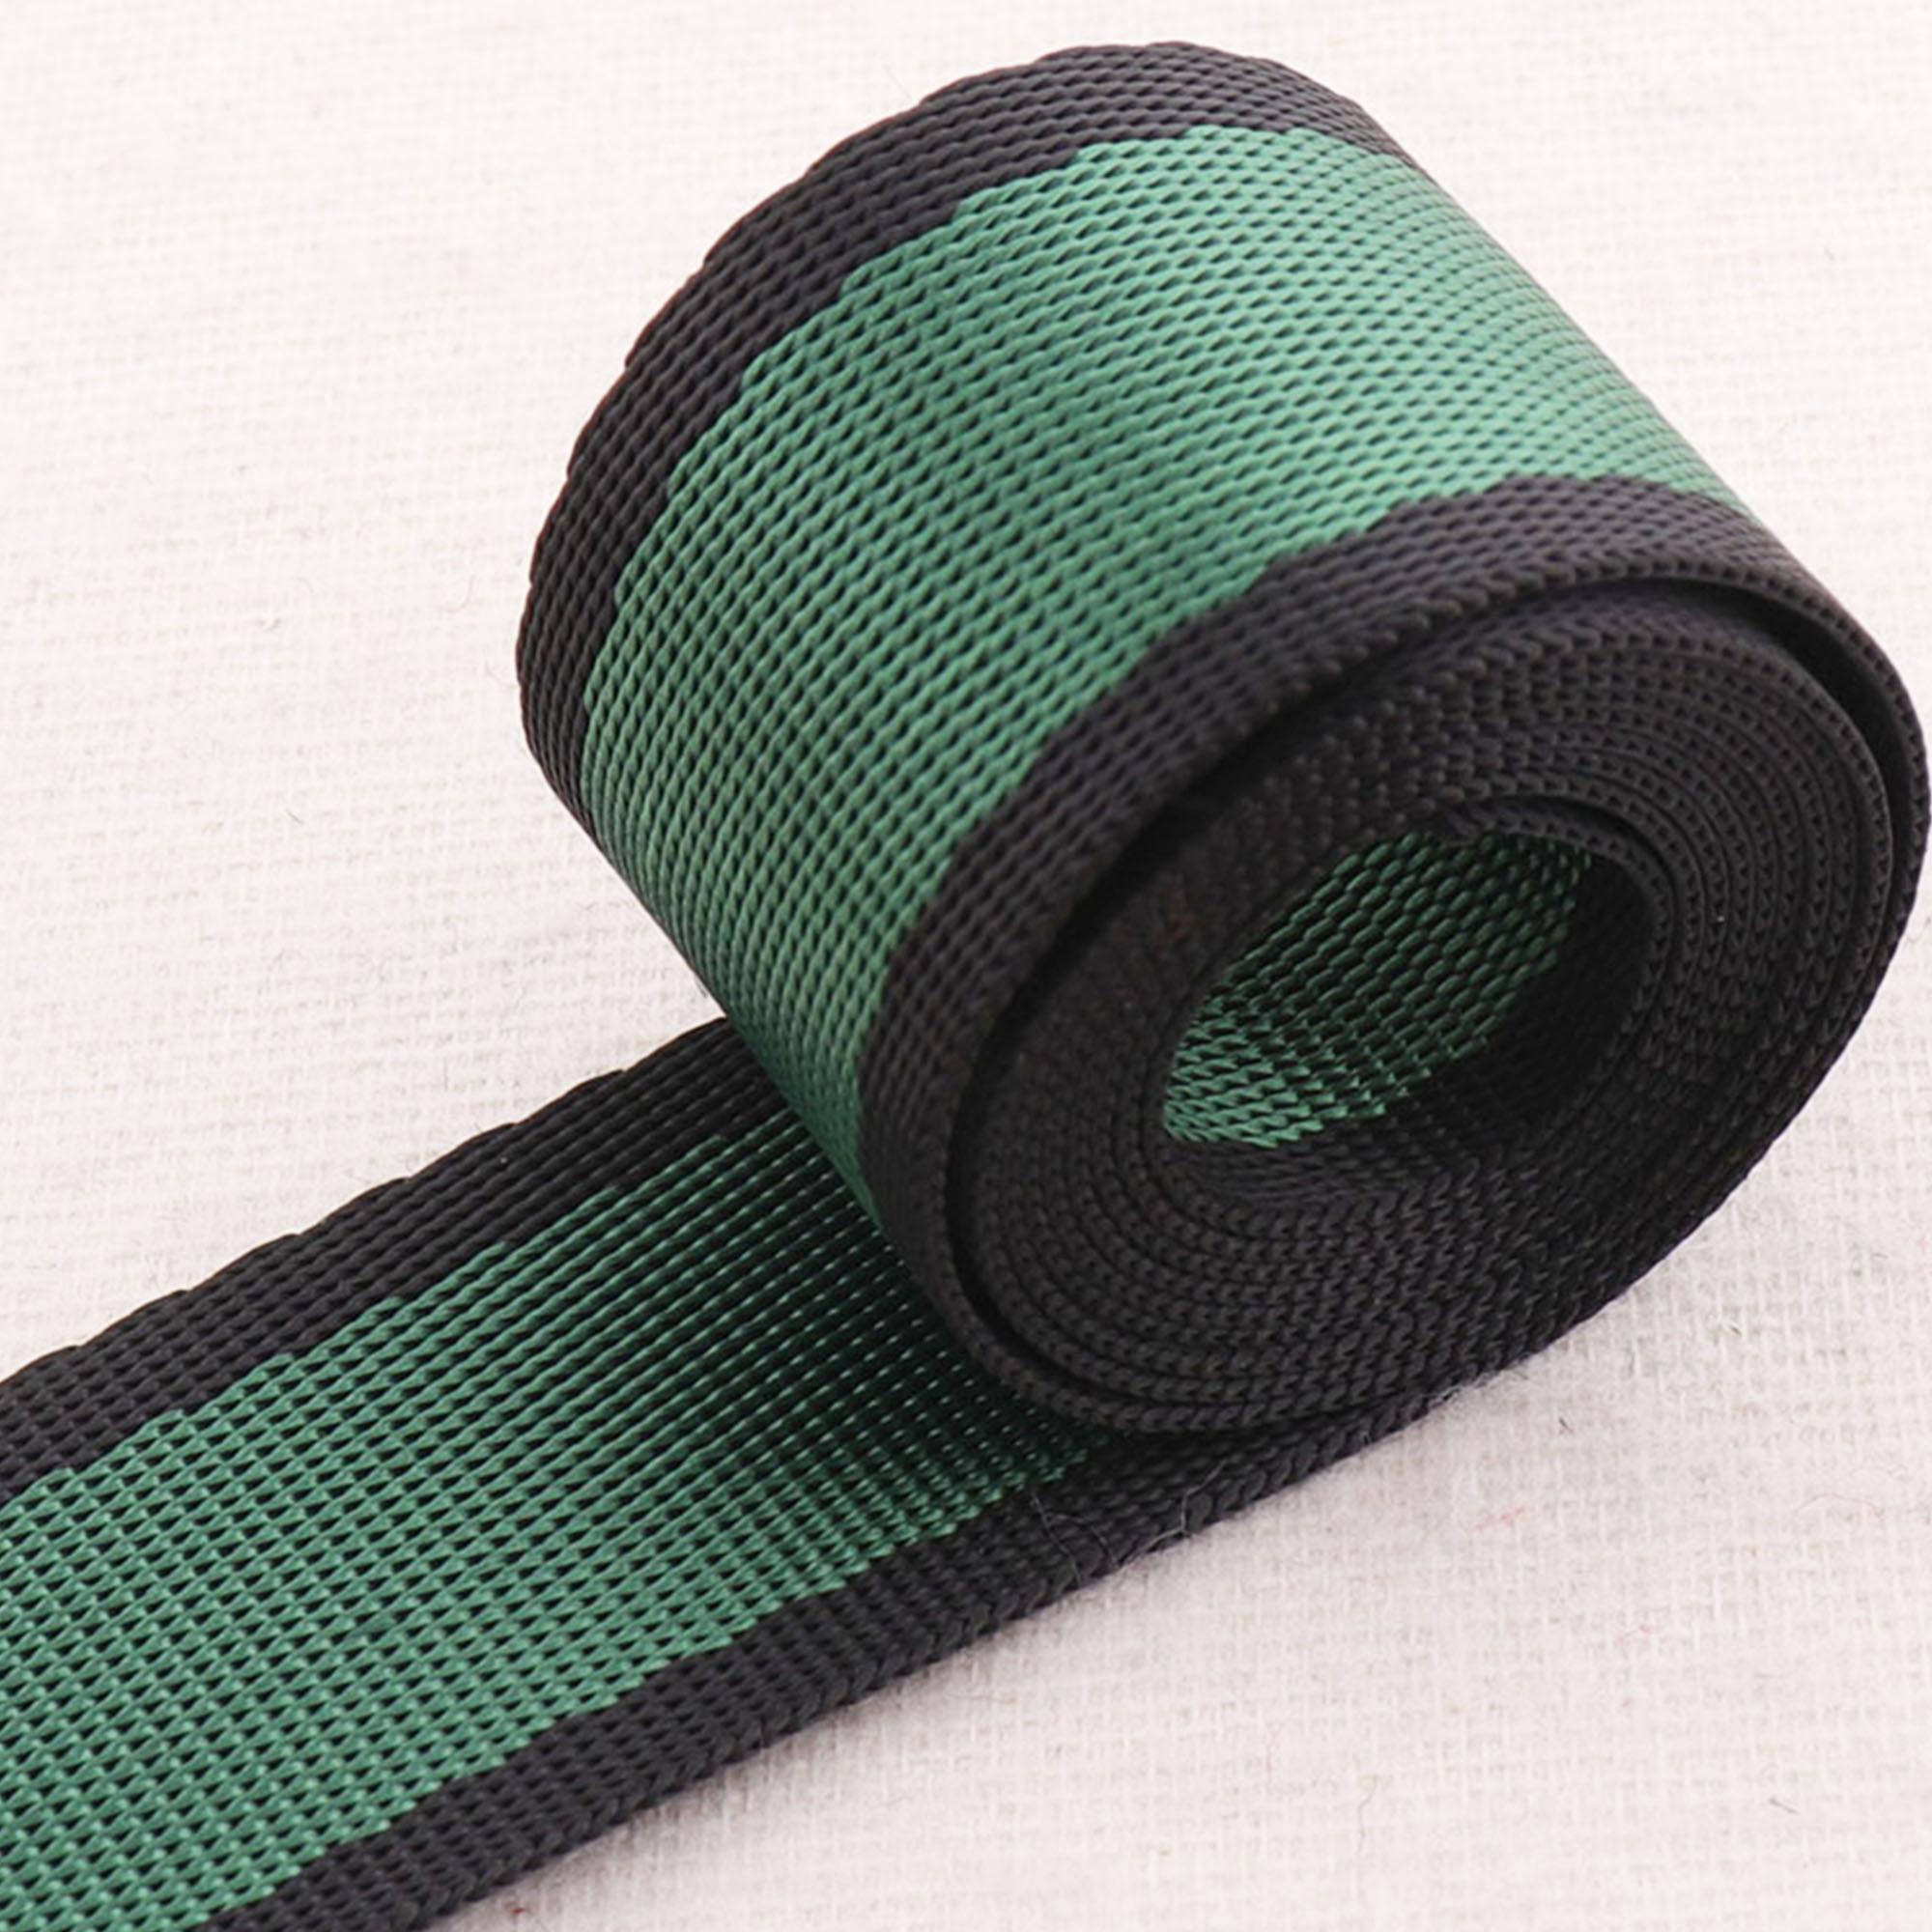 "Correas verde oscuro suave rayas bolsa cinta borde negro Bolsa correas para bolso bolsos bolsa con cinta manija 1 ""(25mm)"